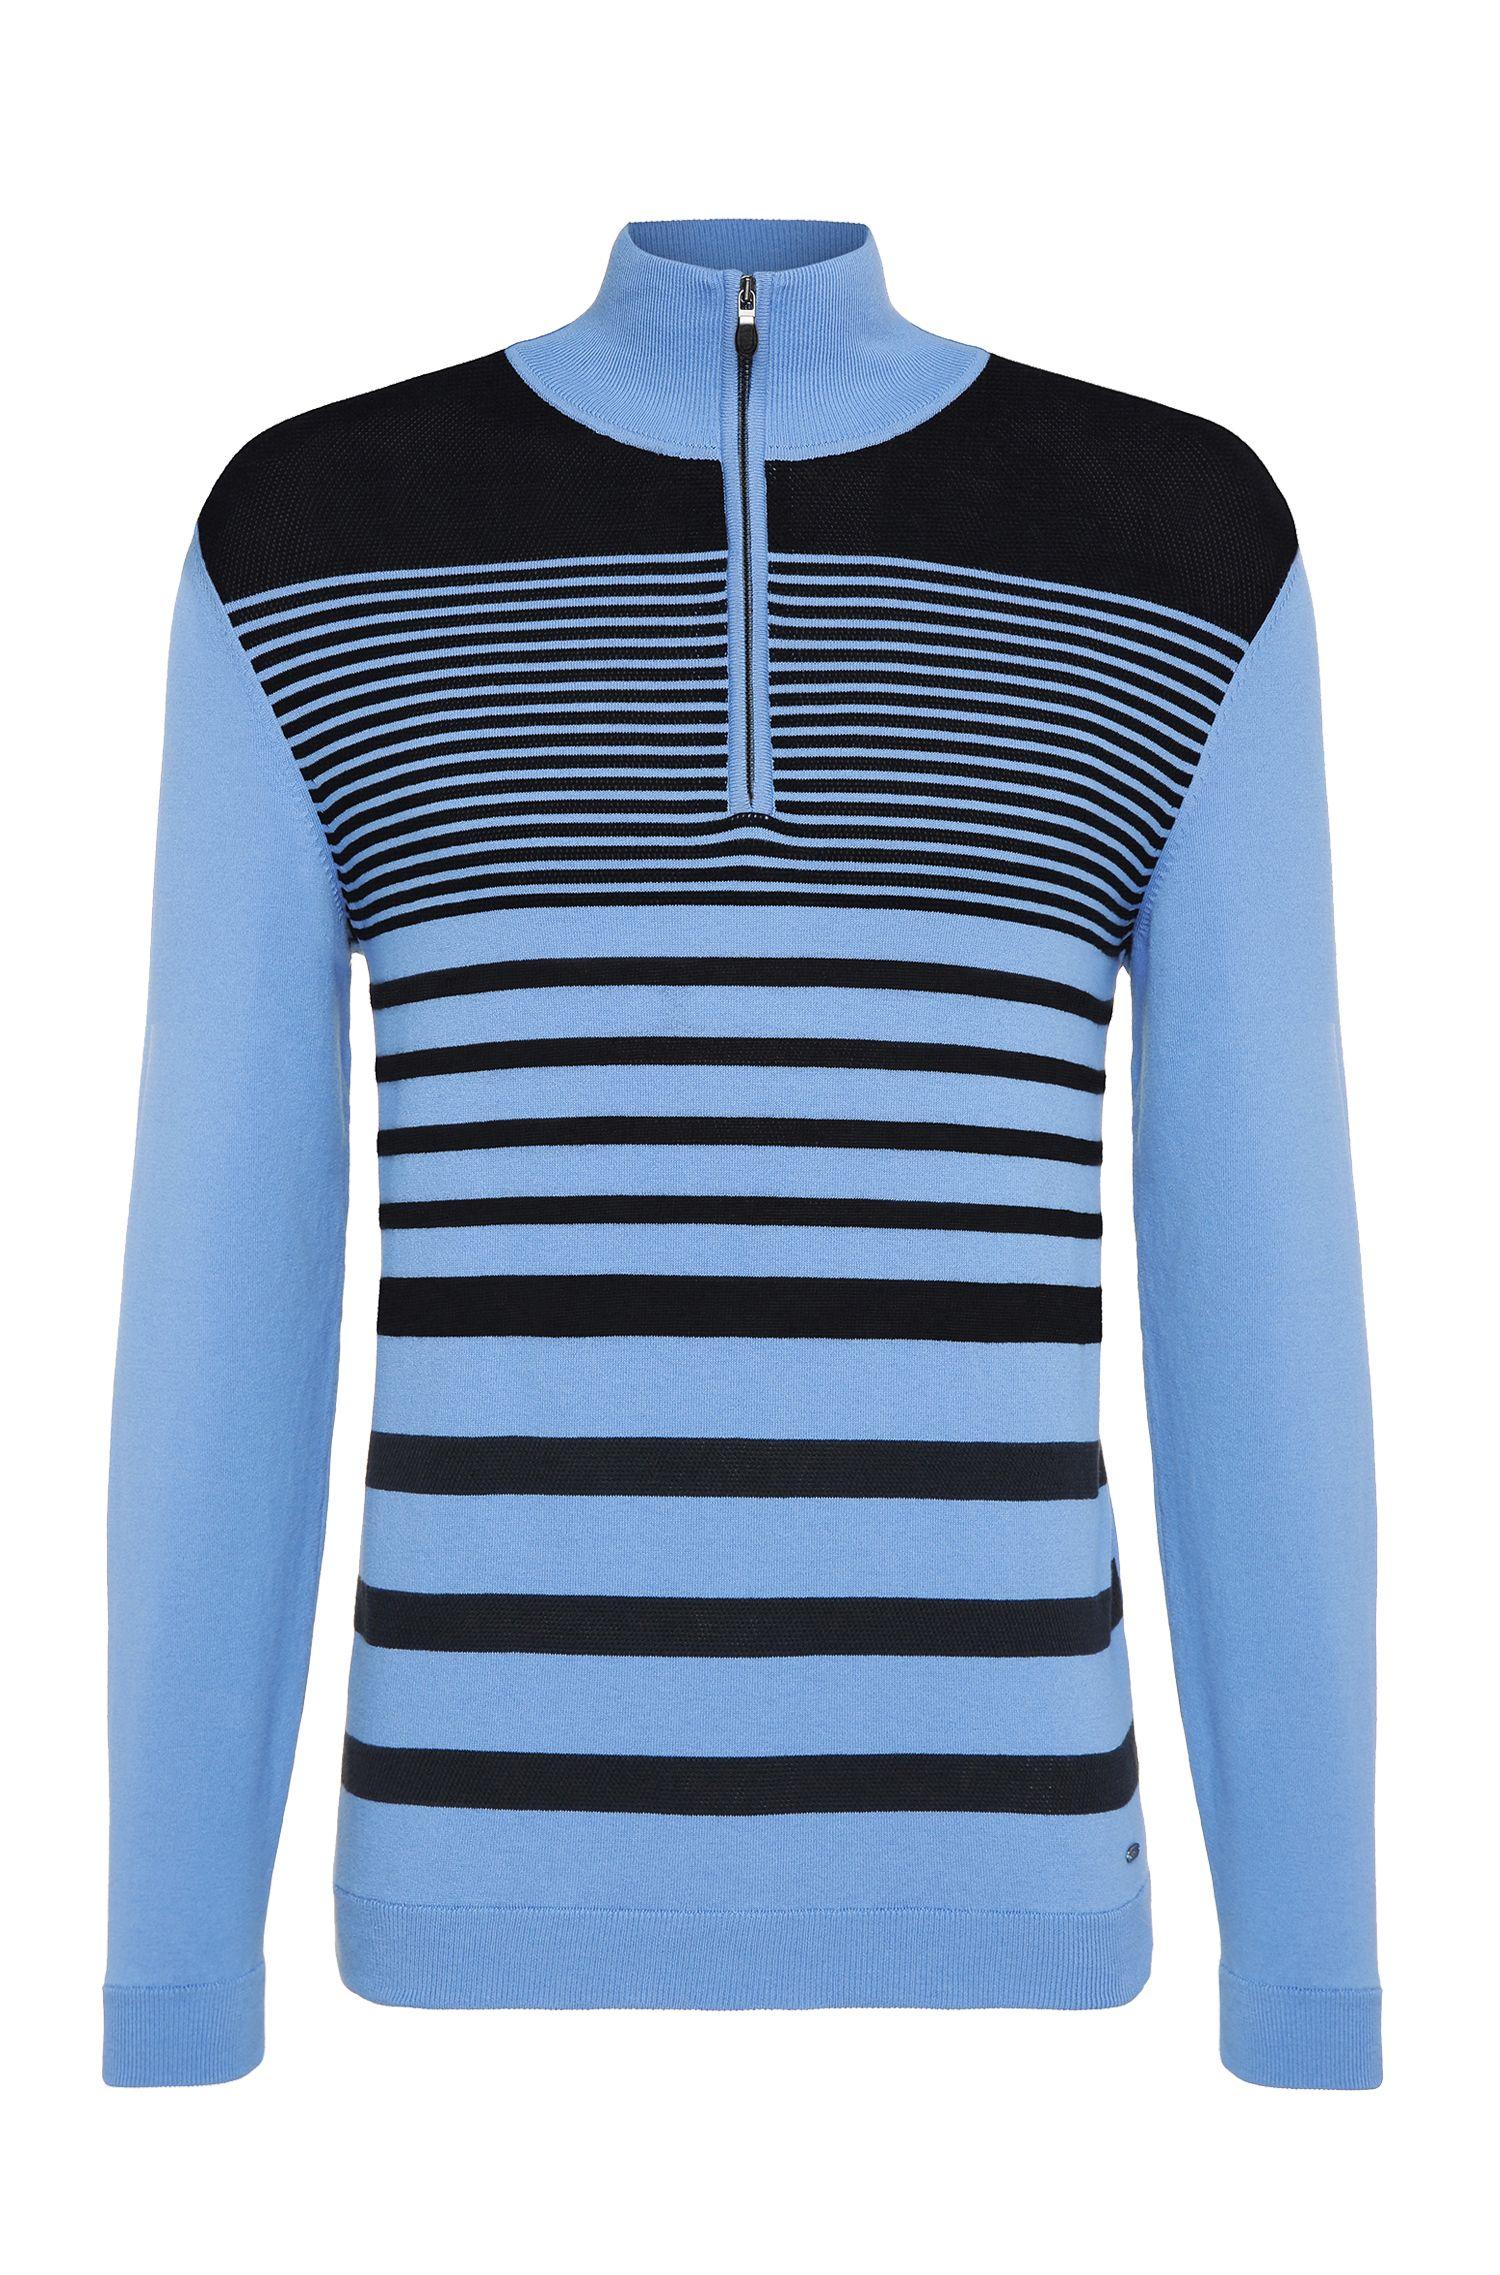 Striped Stretch Cotton Half-Zip Sweater, Slim Fit | Zoco, Blue